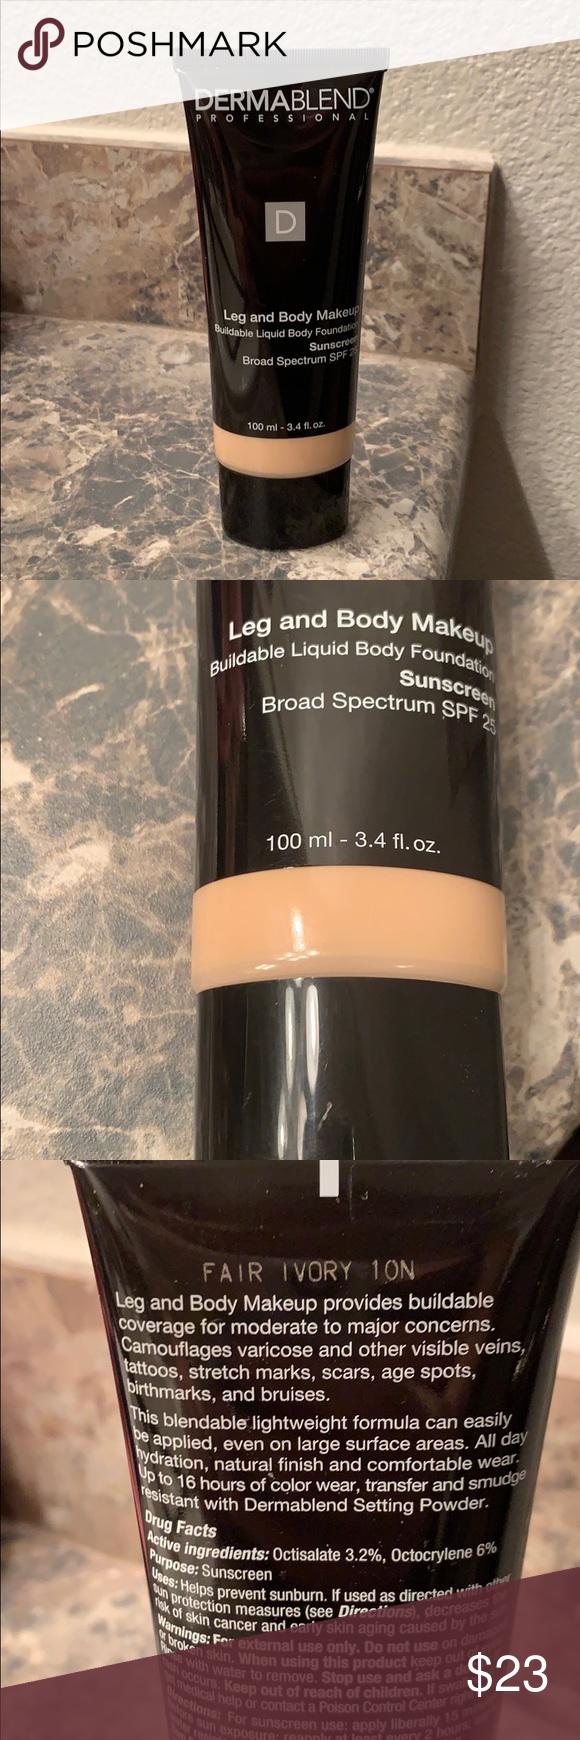 Dermablend Leg and Body Makeup Foundation Dermablend Leg